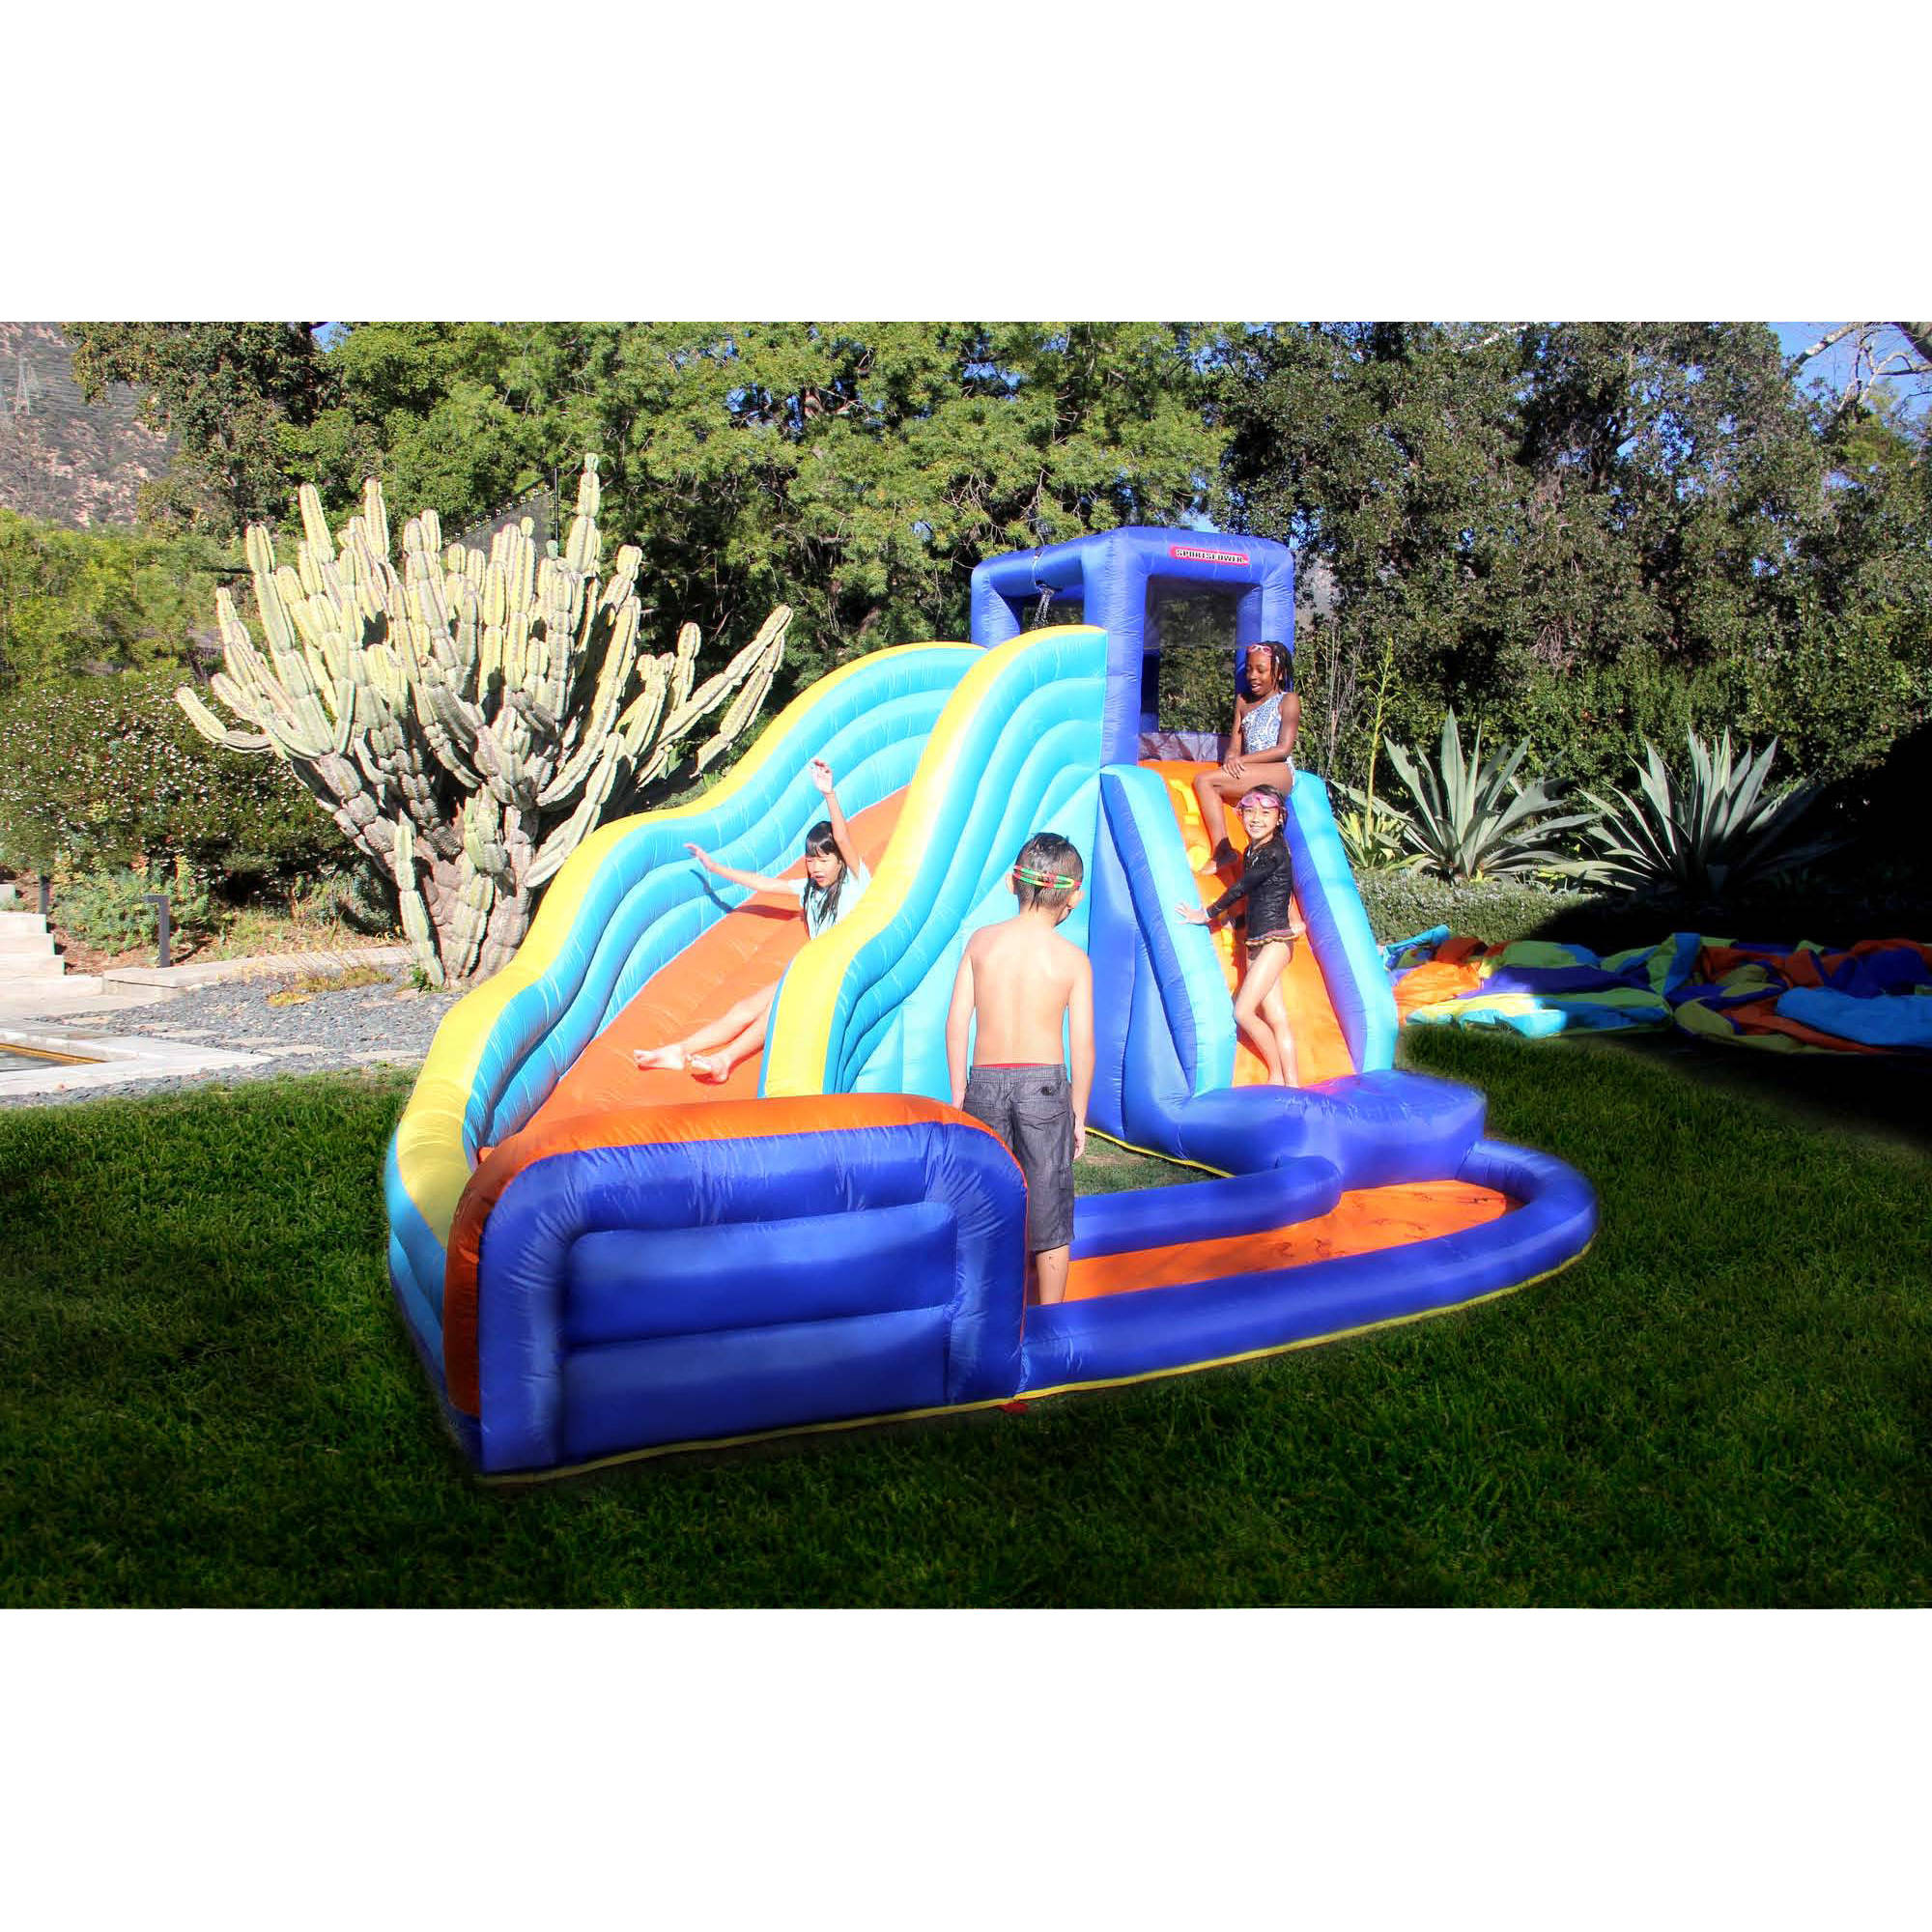 Sportspower Outdoor Big Wave Inflatable Waterslide by Sportspower